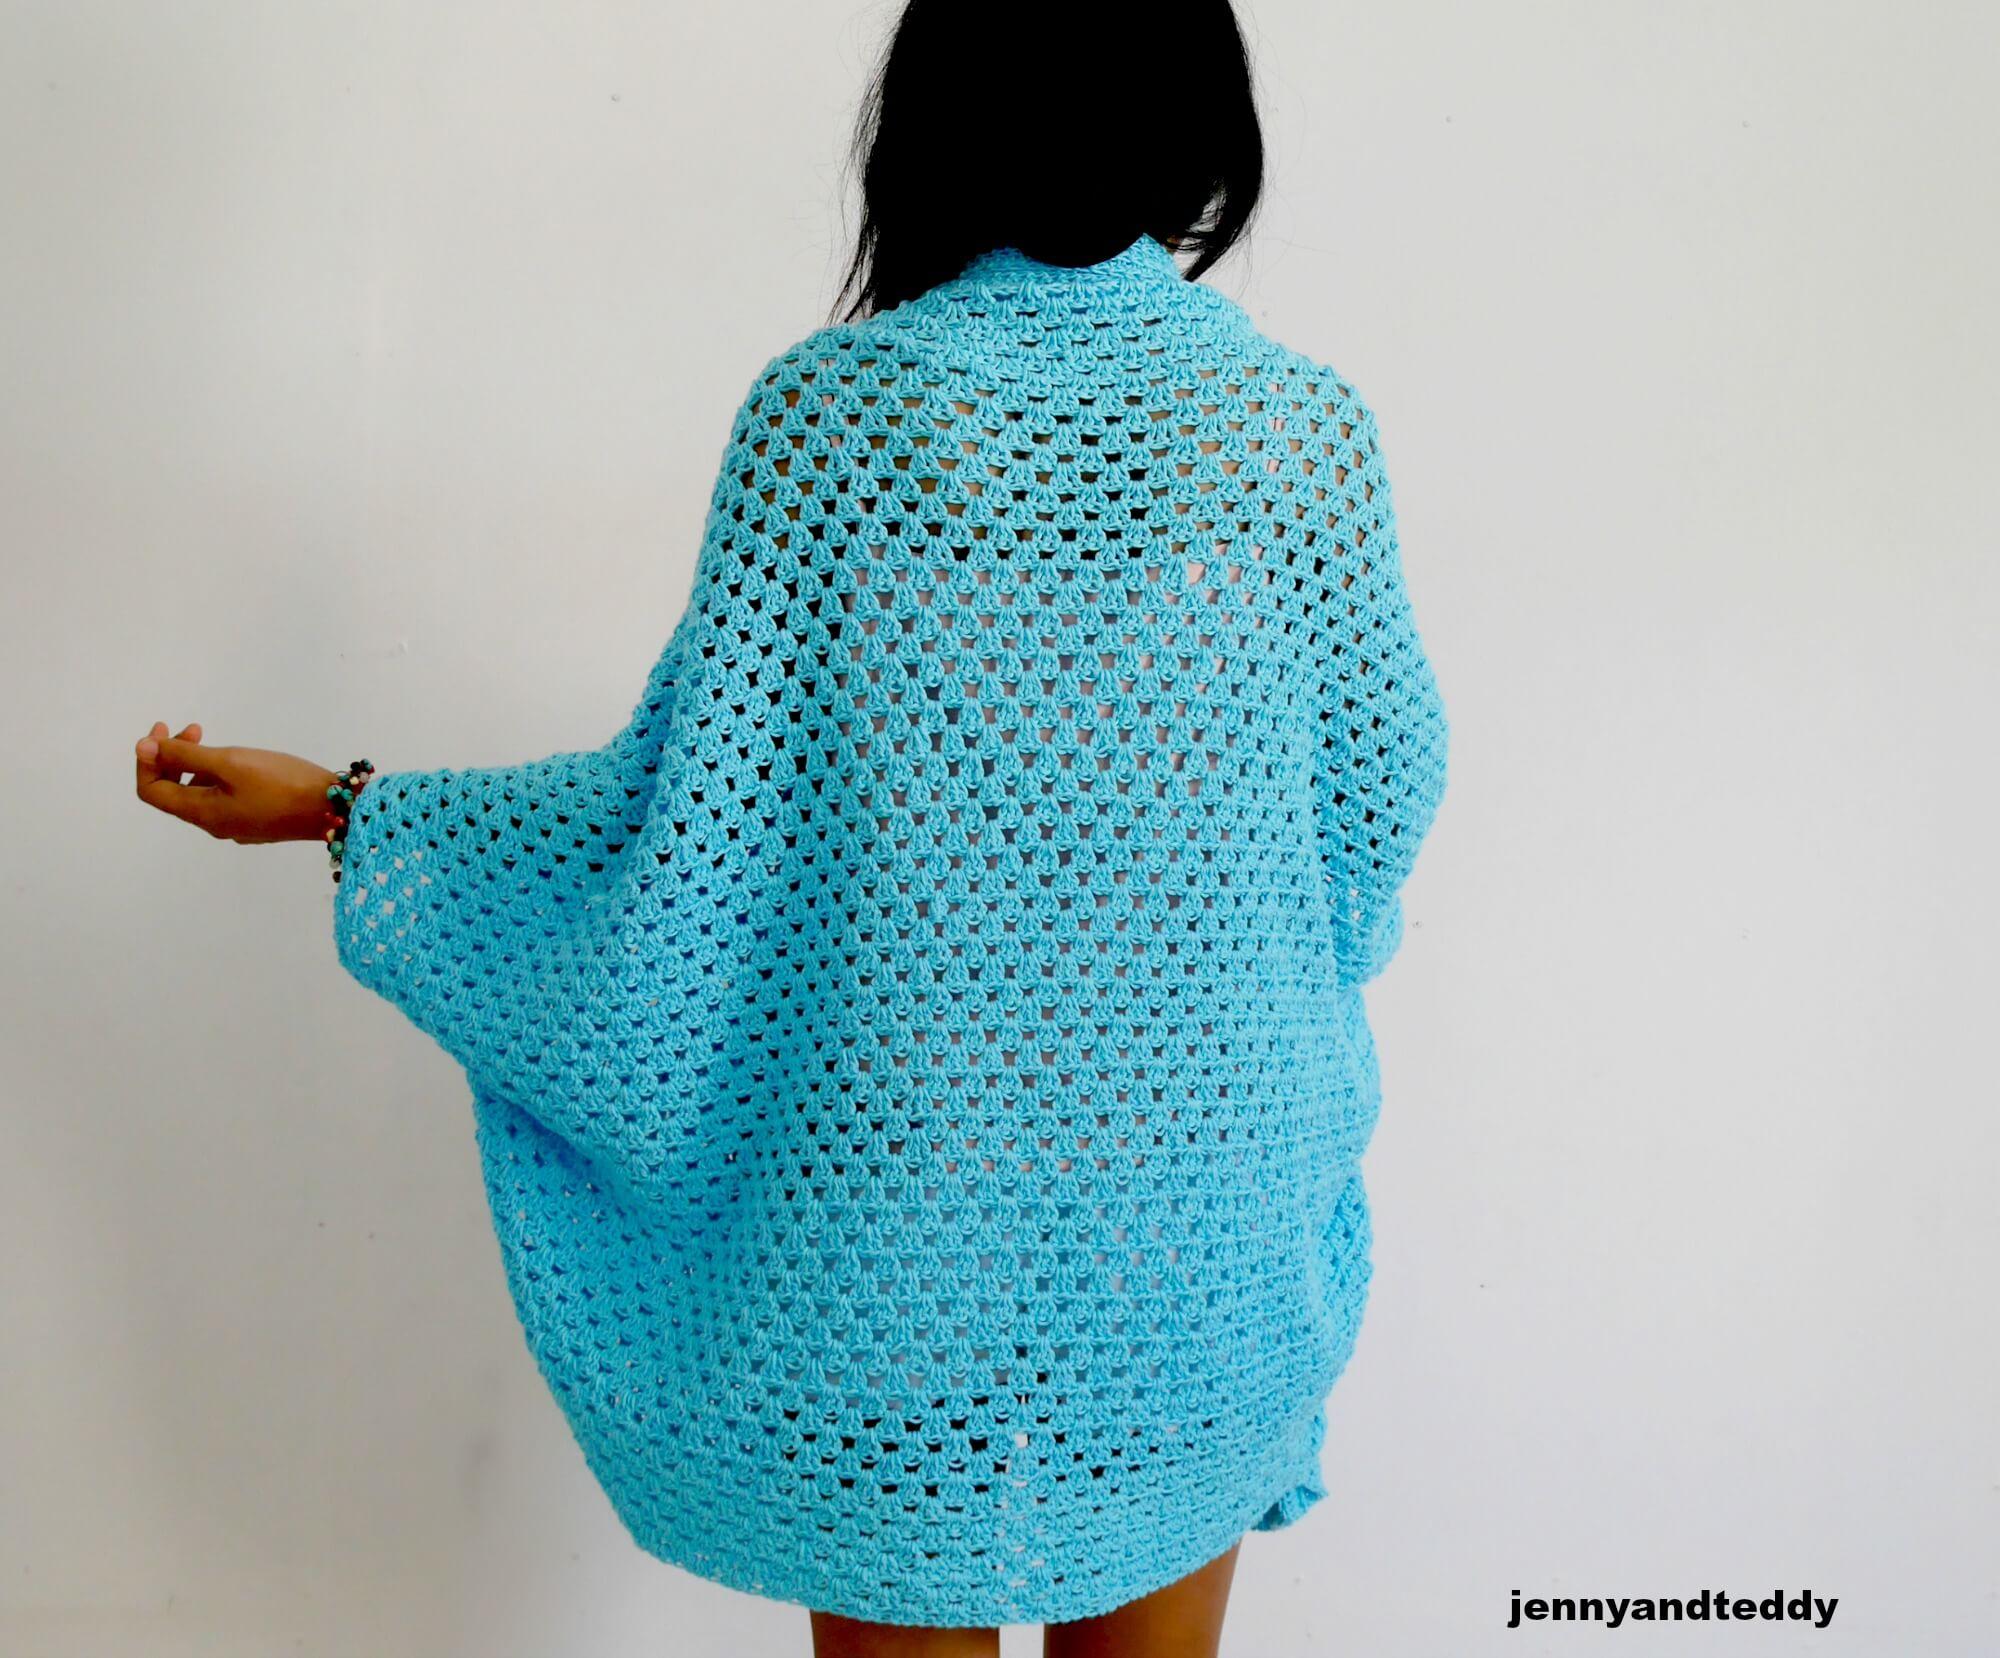 granny square crochet stitch cardigan for beginner